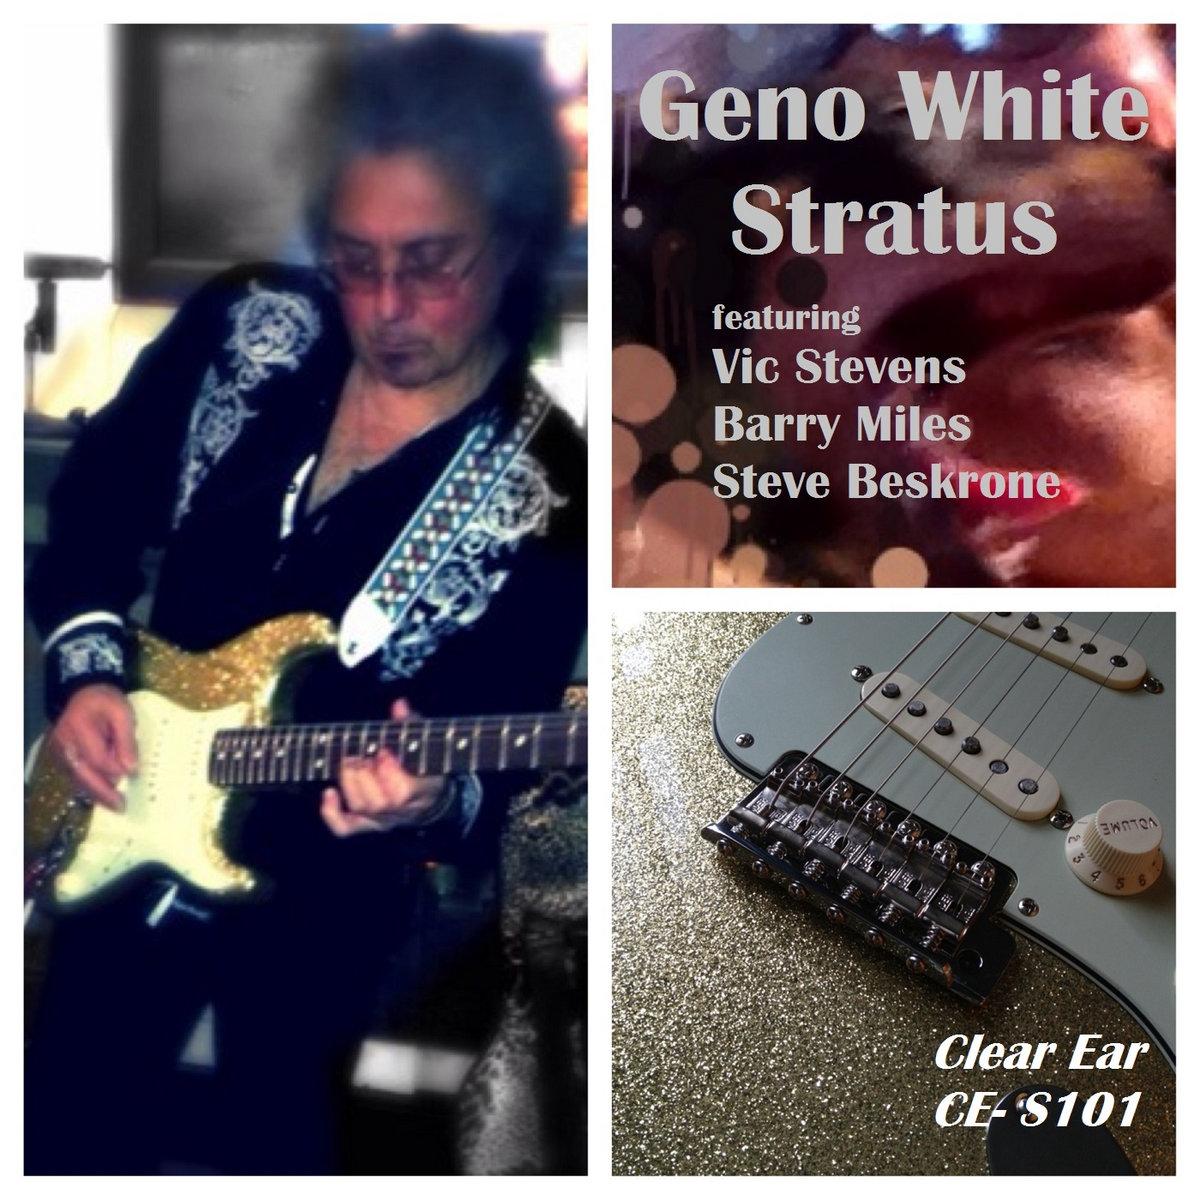 Stratus by Geno White